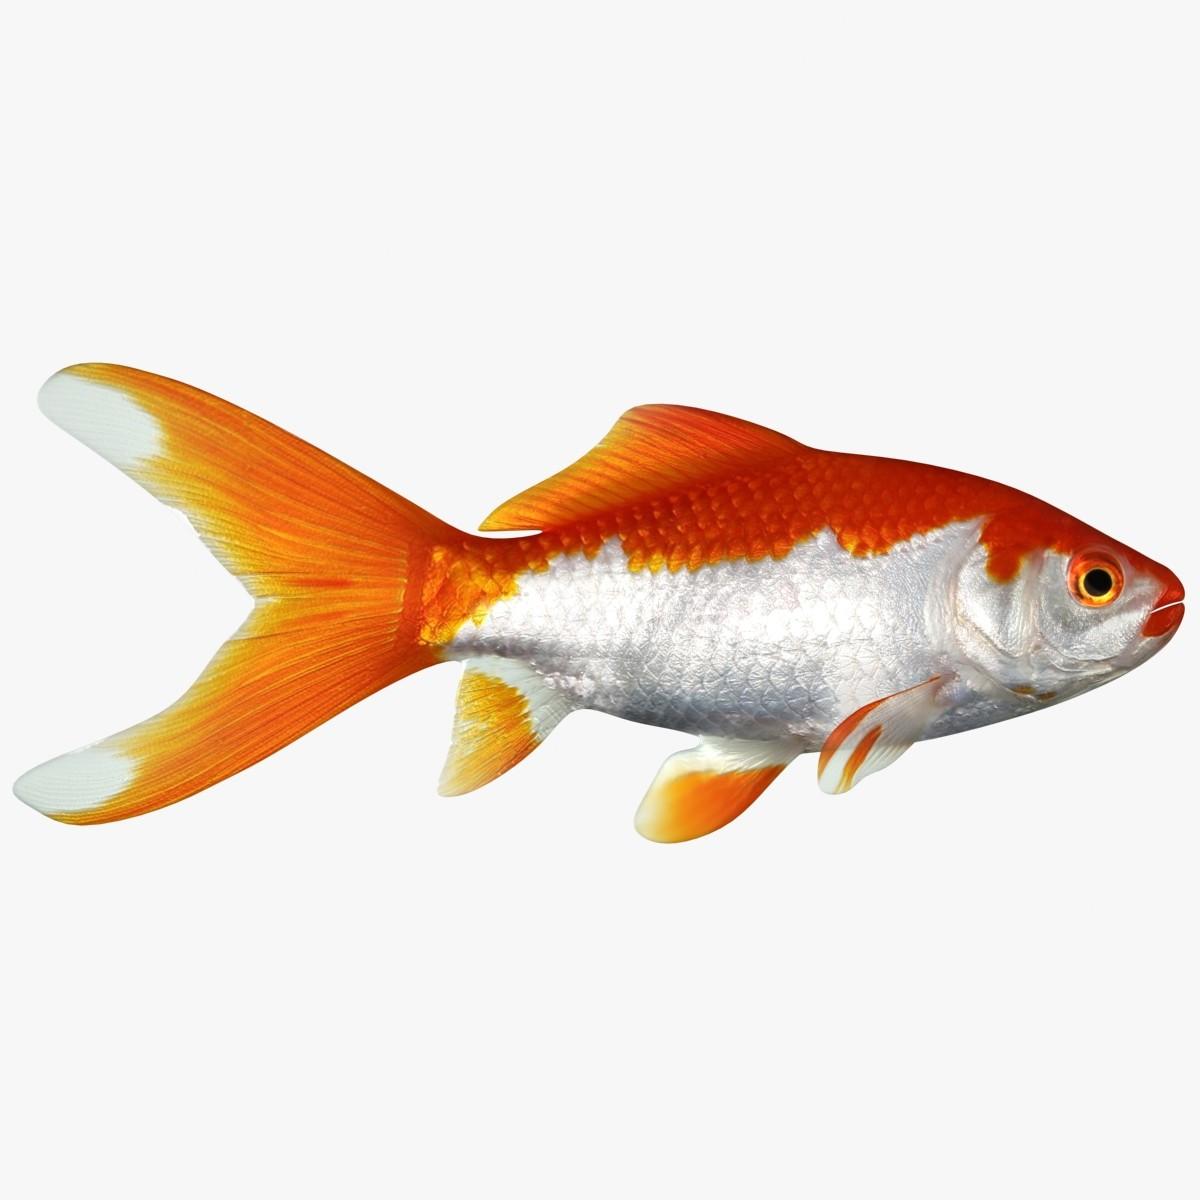 Goldfish_2_Rr-01 - Copy.jpg